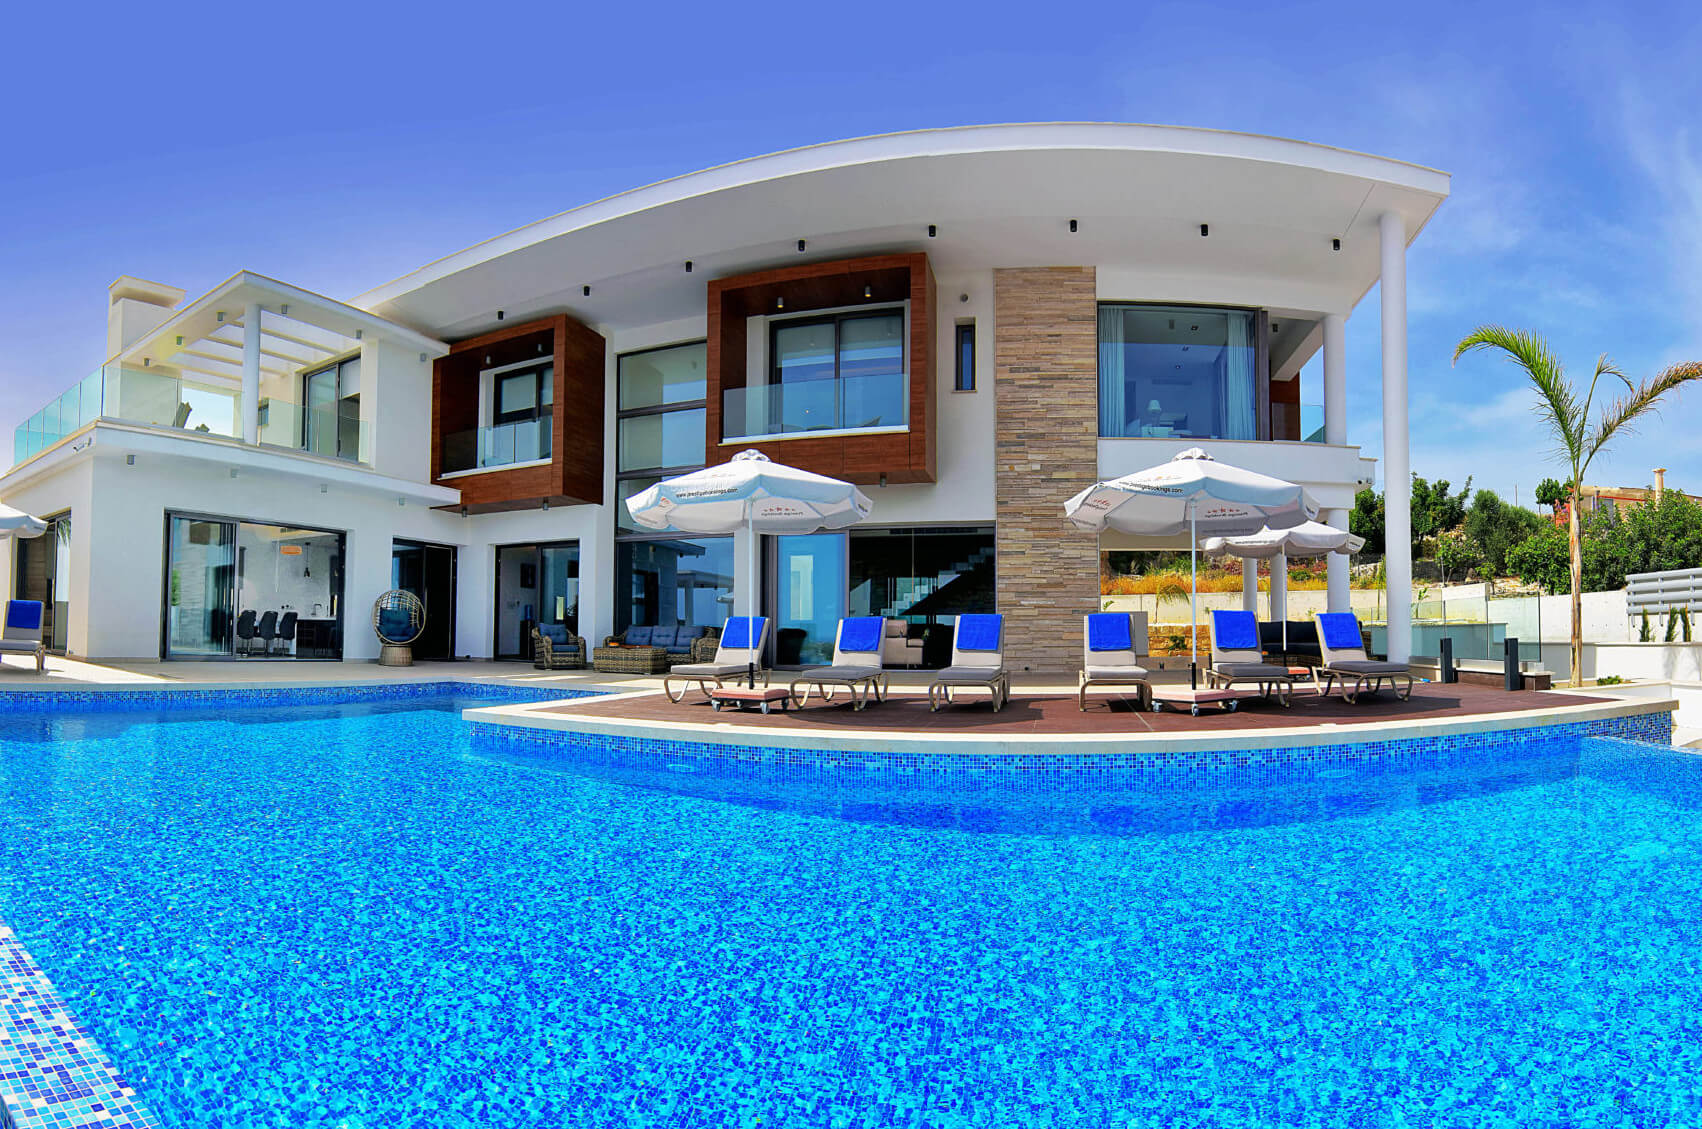 Villas- The Best Rental Option for Families